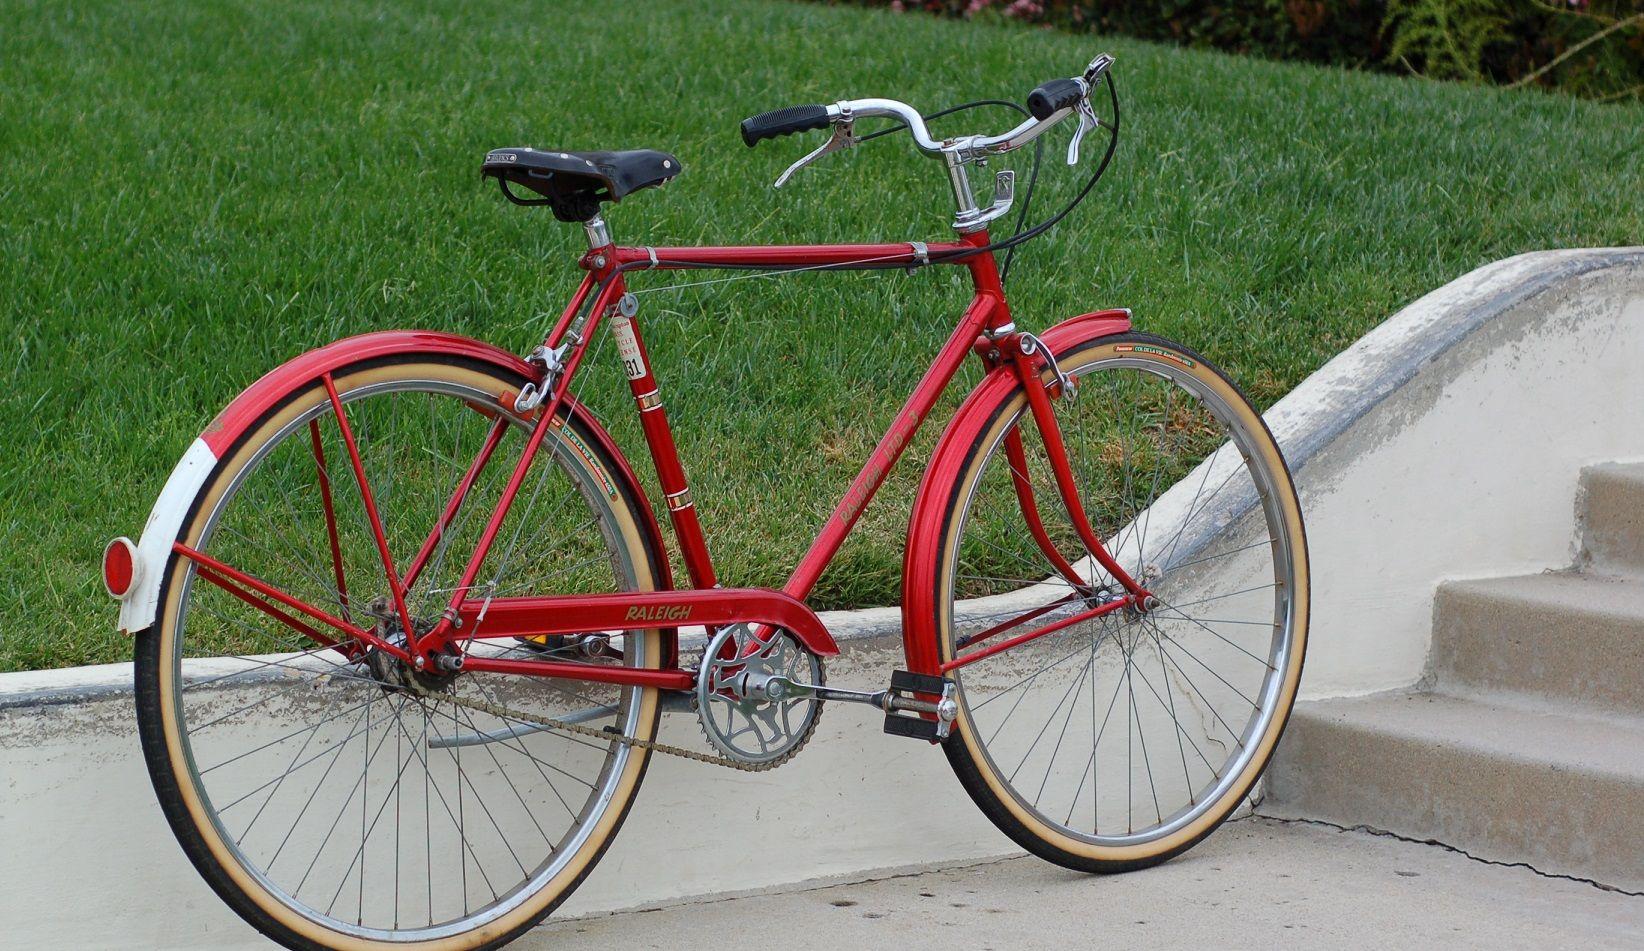 Beautiful Classic Raleigh Sports 3 Speed Bike Raleigh Bikes Raleigh Bicycle Urban Bicycle